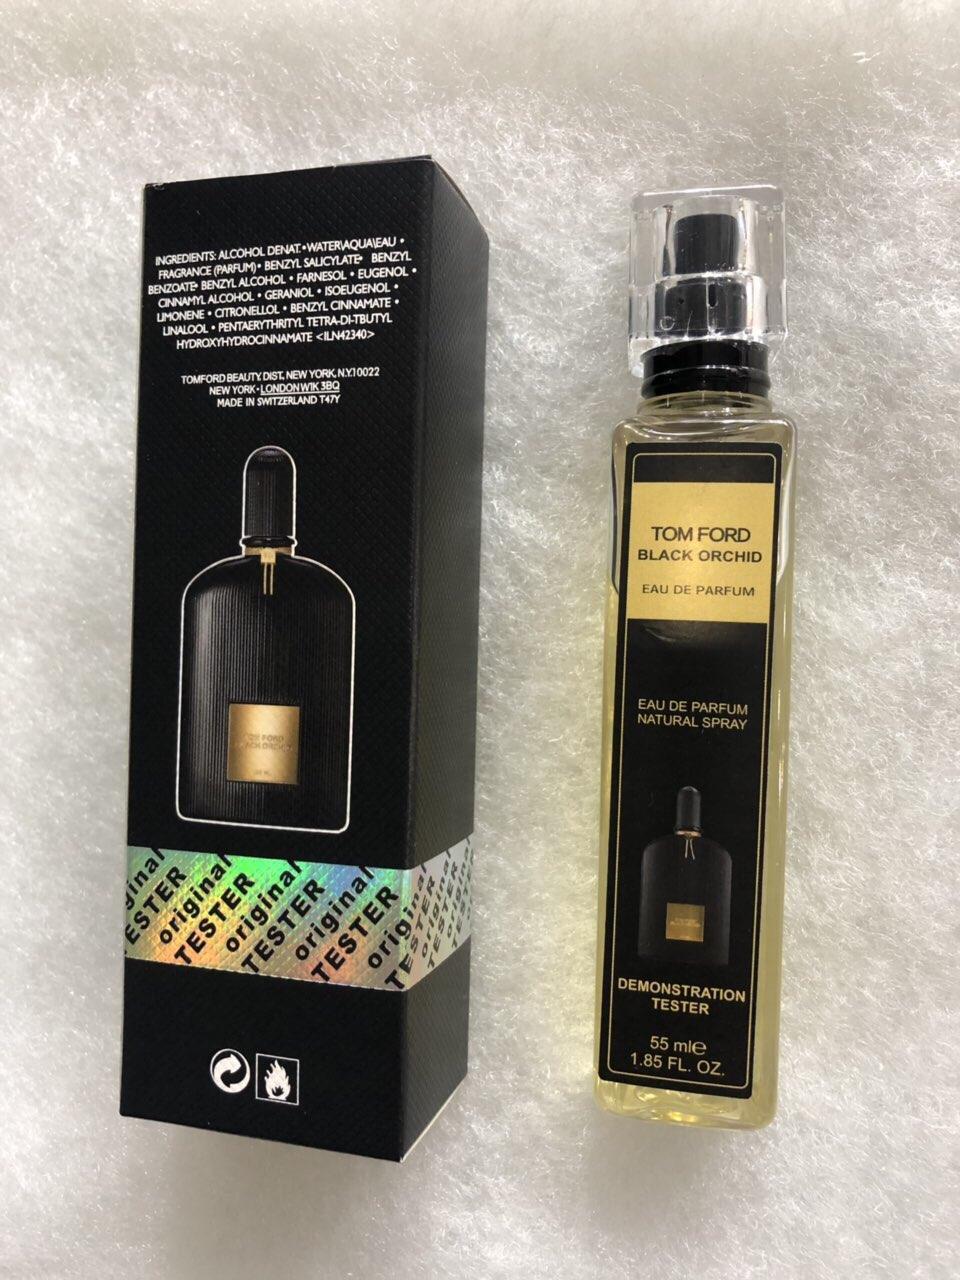 Мини парфюм женский тестер Tom Ford Black Orchid (Том Форд Блэк Орхид) 55 ml (реплика)